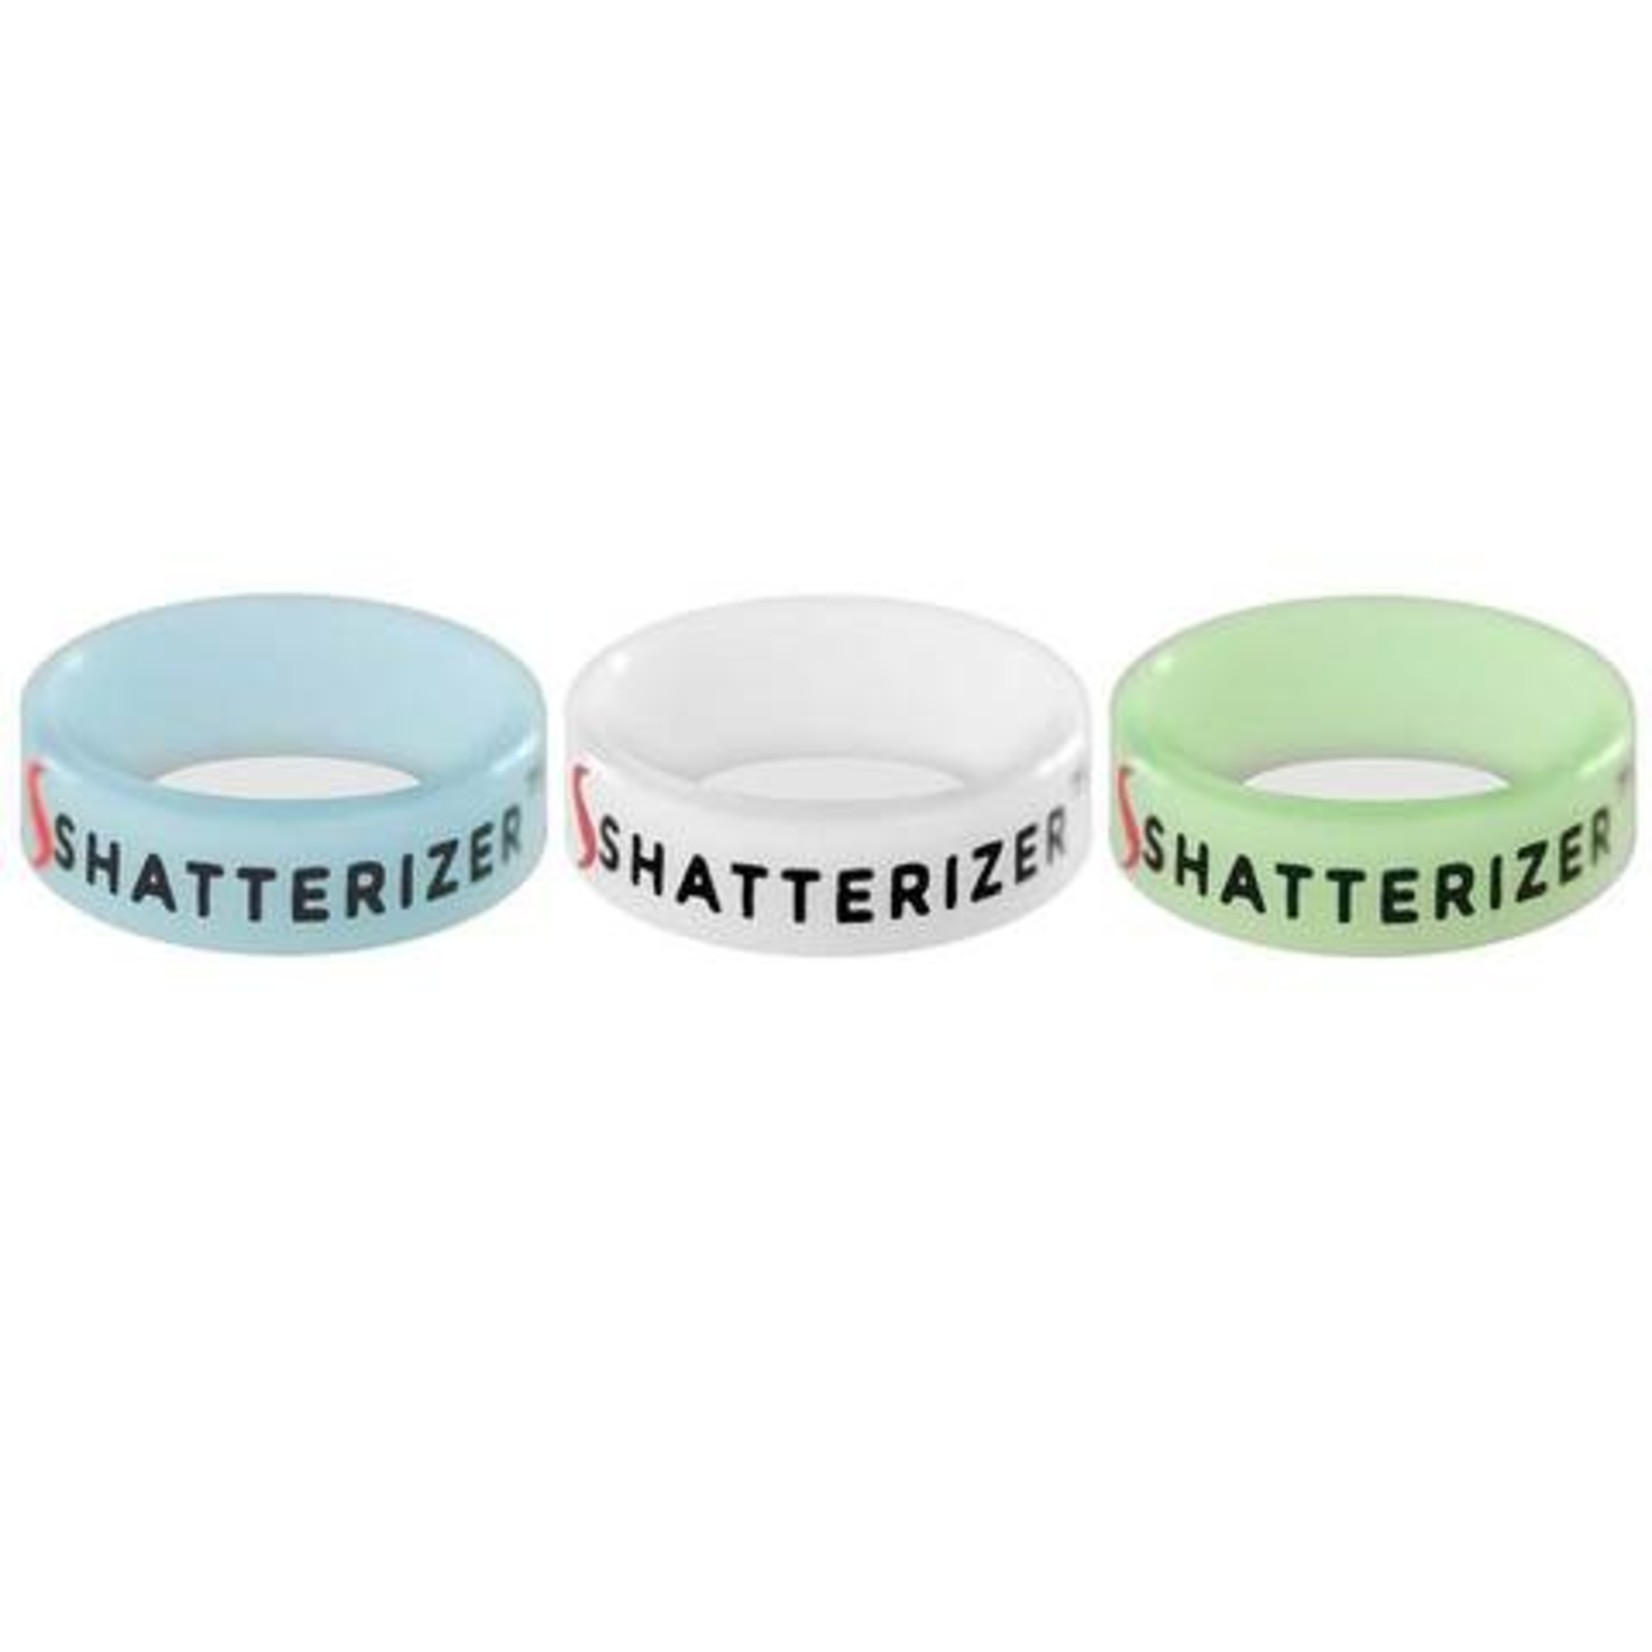 Shatterizer SHATTERIZER GLOW RING